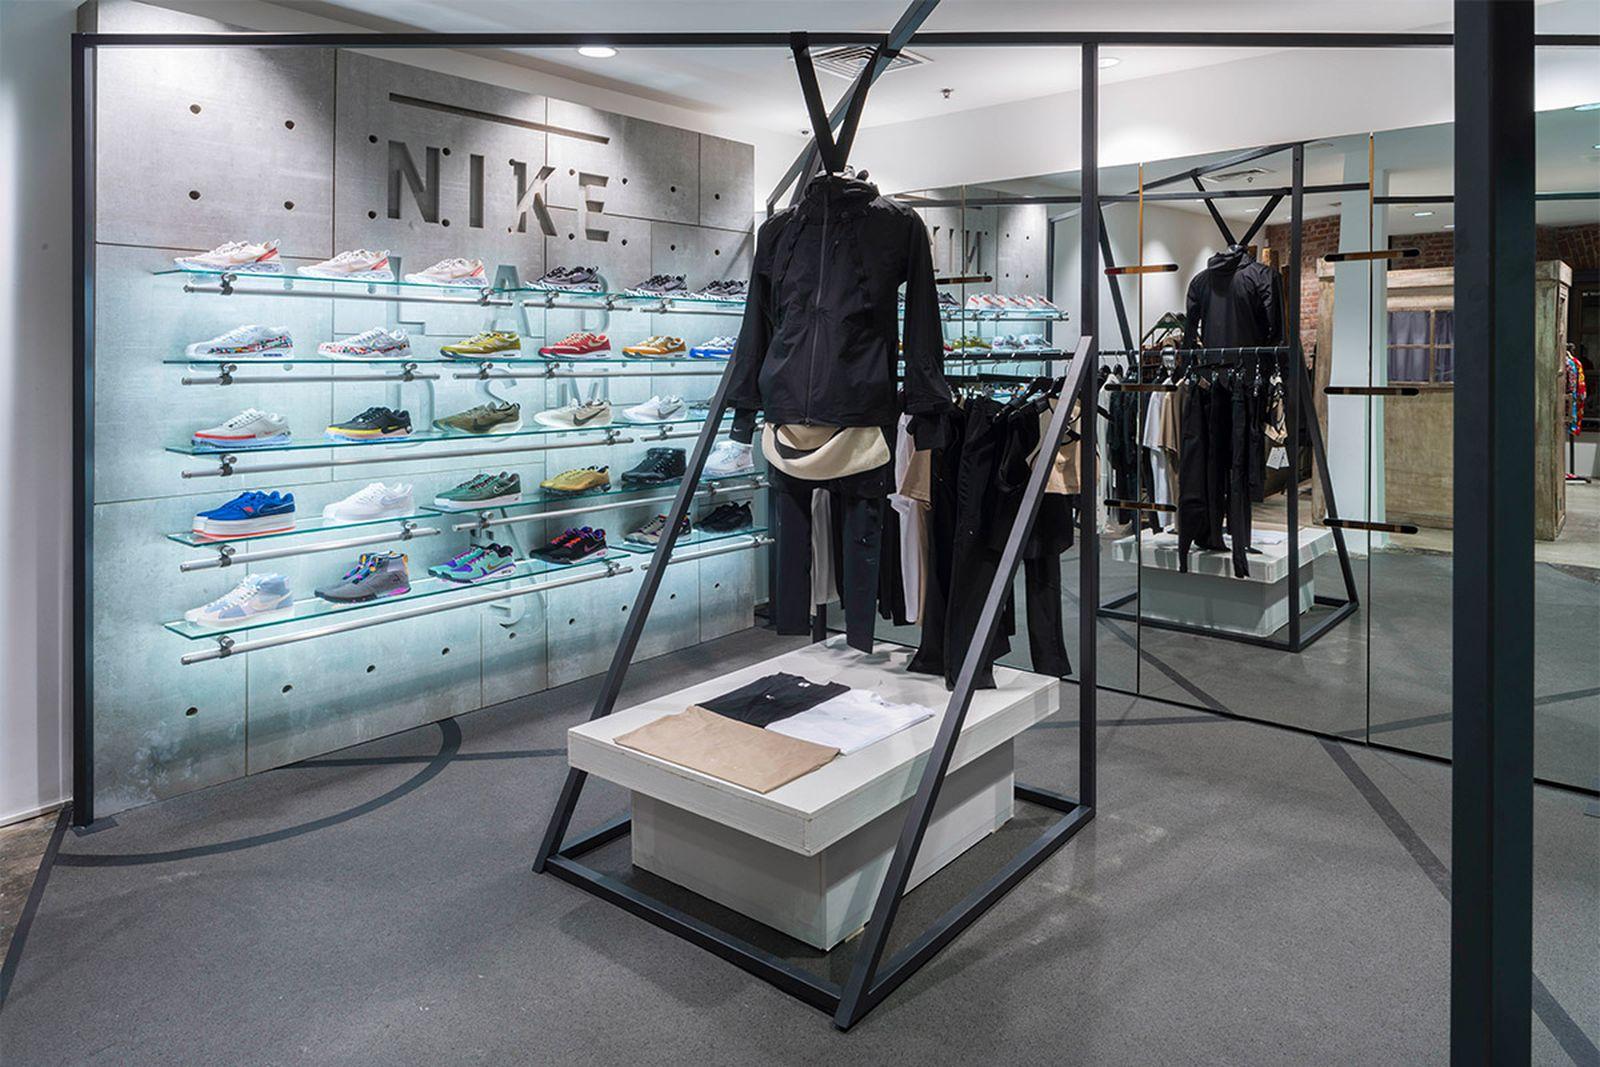 best new york sneaker stores dover street market AMEX american express platinum